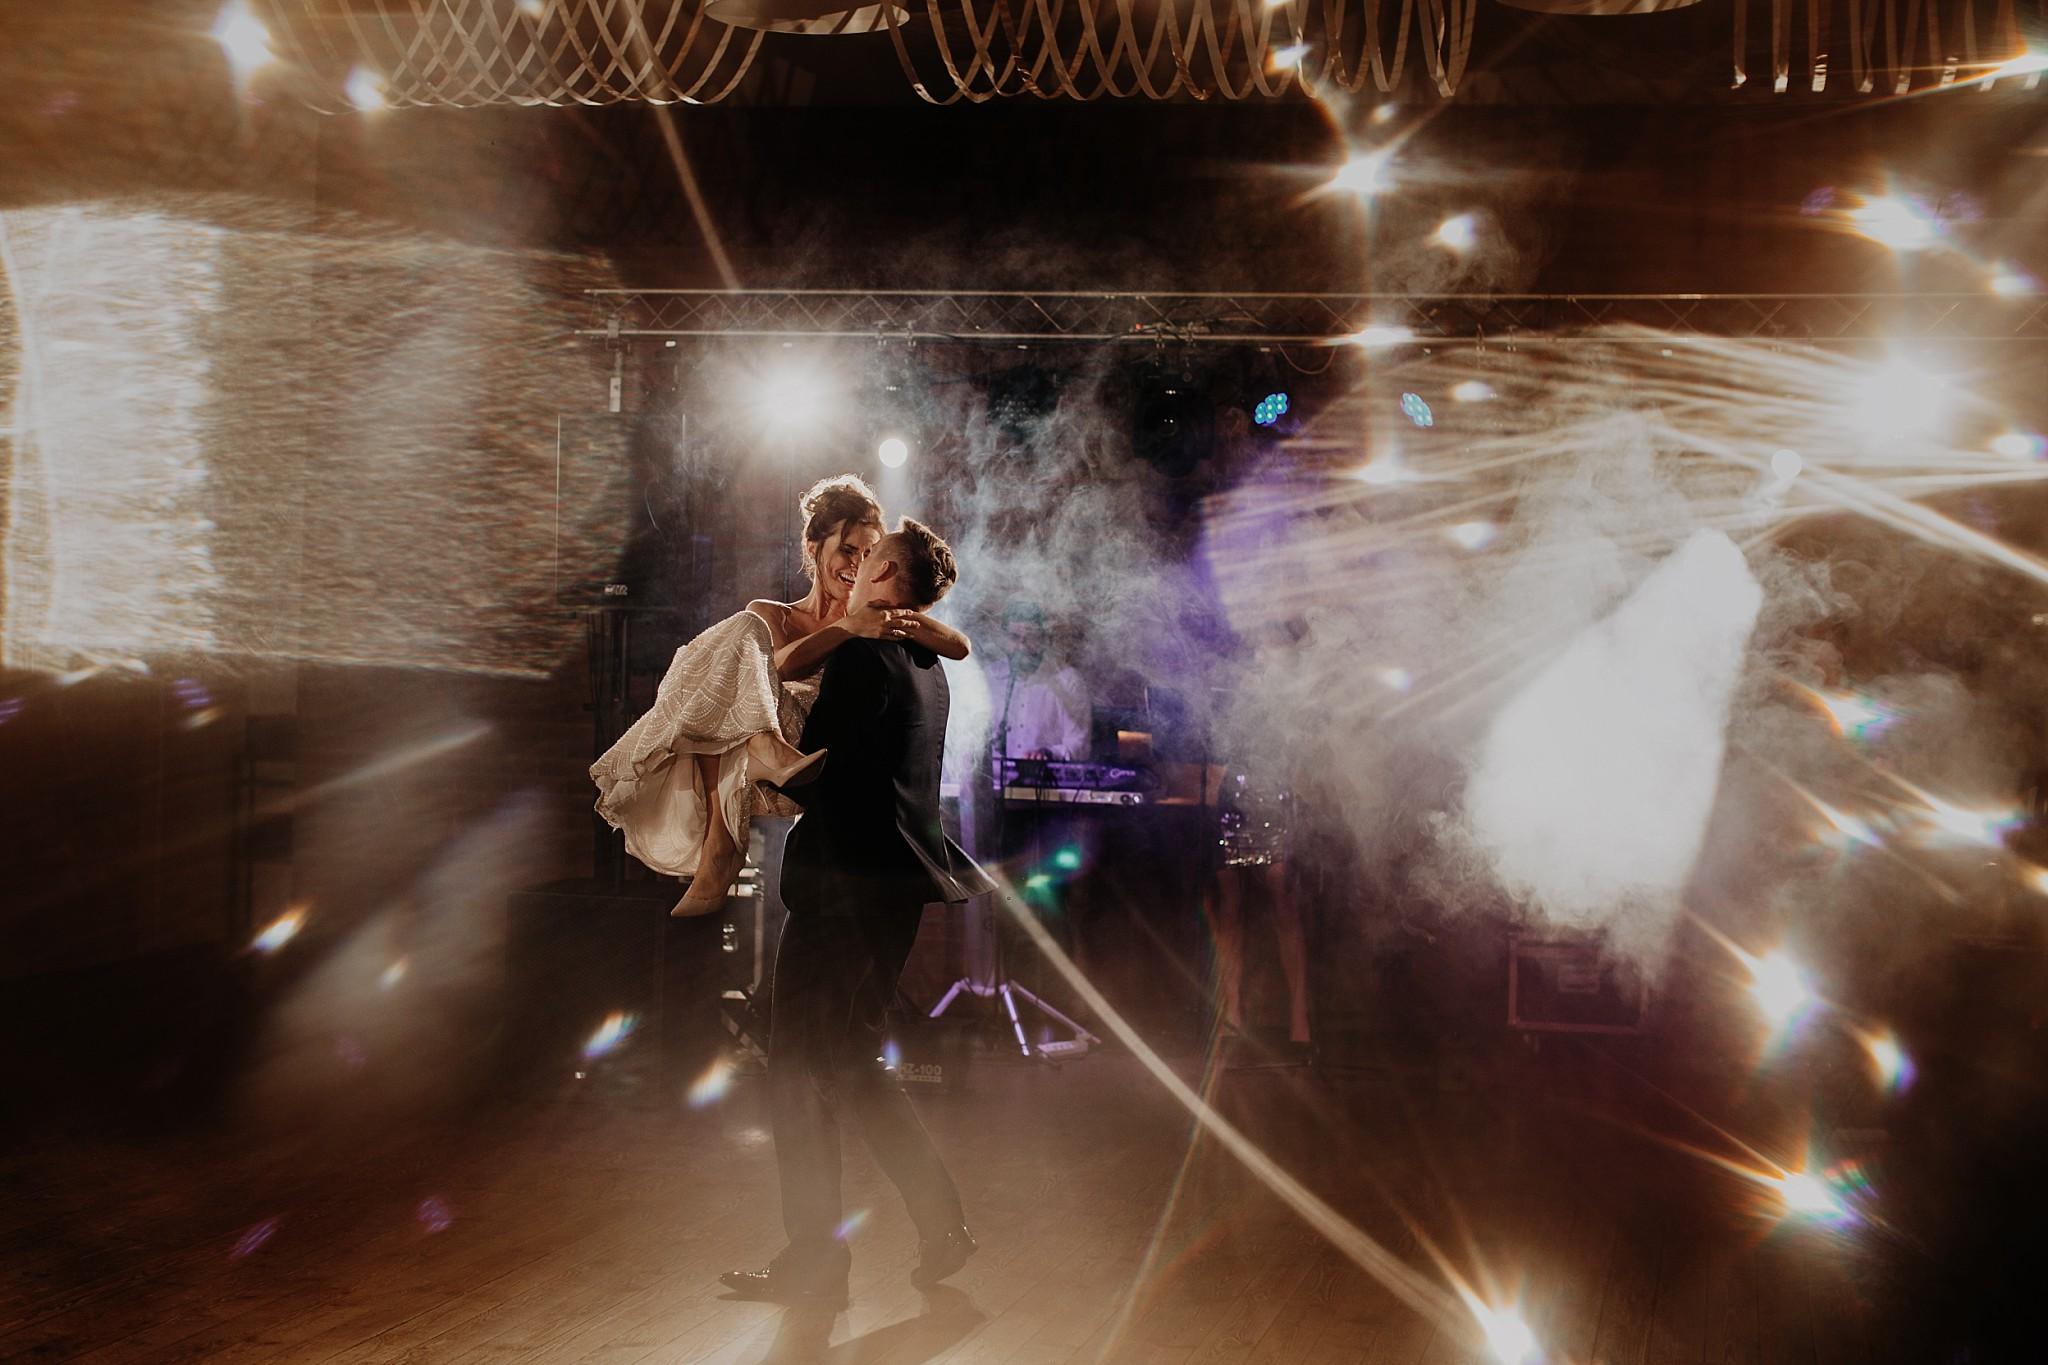 fotograf poznan wesele dobra truskawka piekne wesele pod poznaniem wesele w dobrej truskawce piekna para mloda slub marzen slub koronawirus slub listopad wesele koronawirus 513